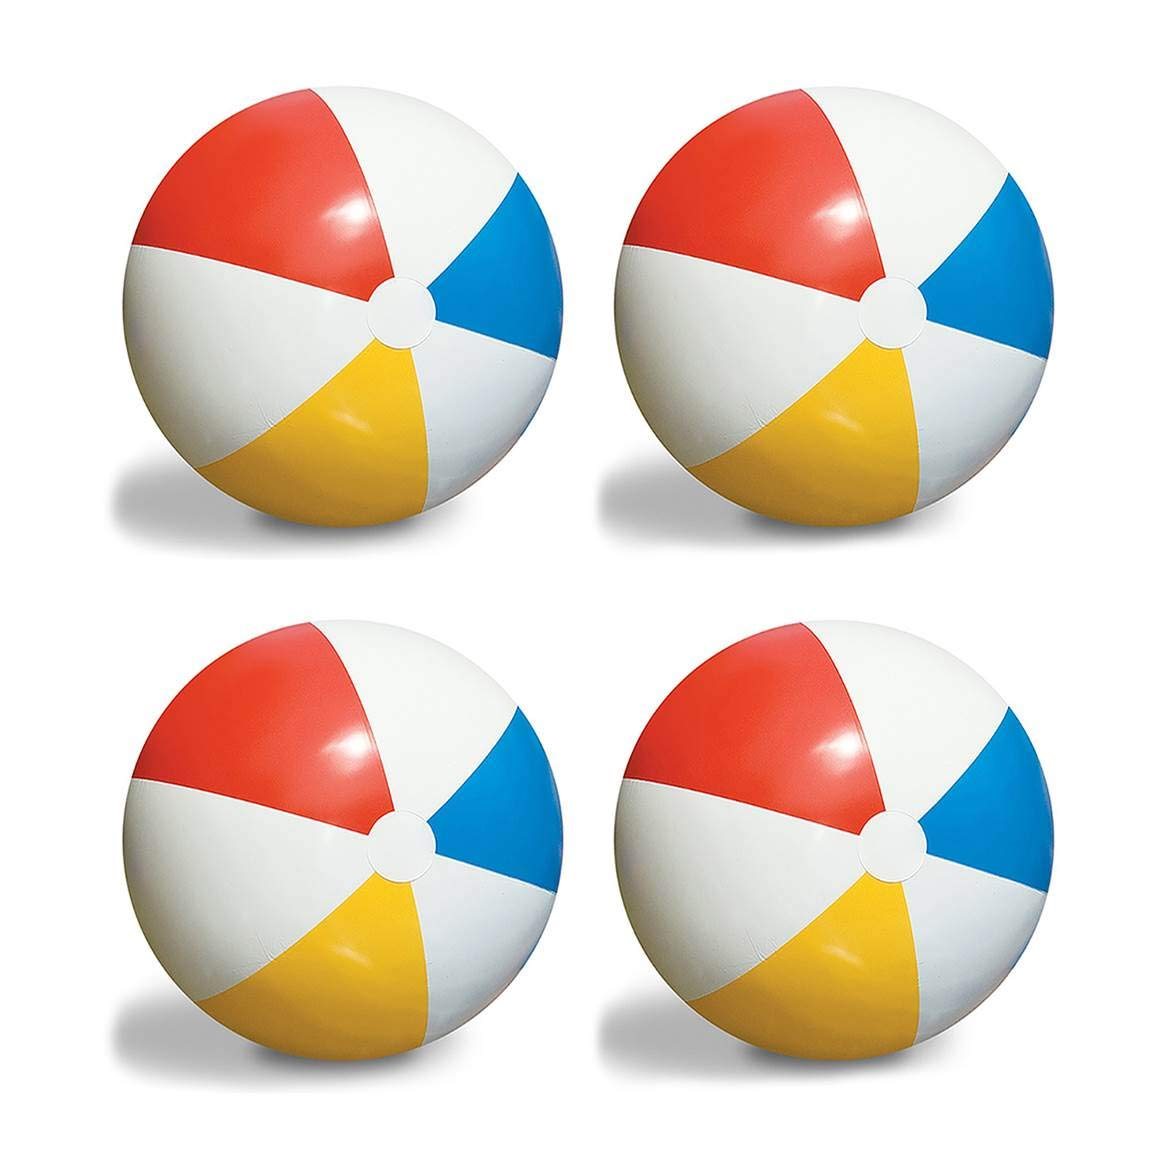 4-Pack Swimline Inflatable 36-Inch Classic Rainbow Giant Beach Balls | 4 x 90036 by Swimline